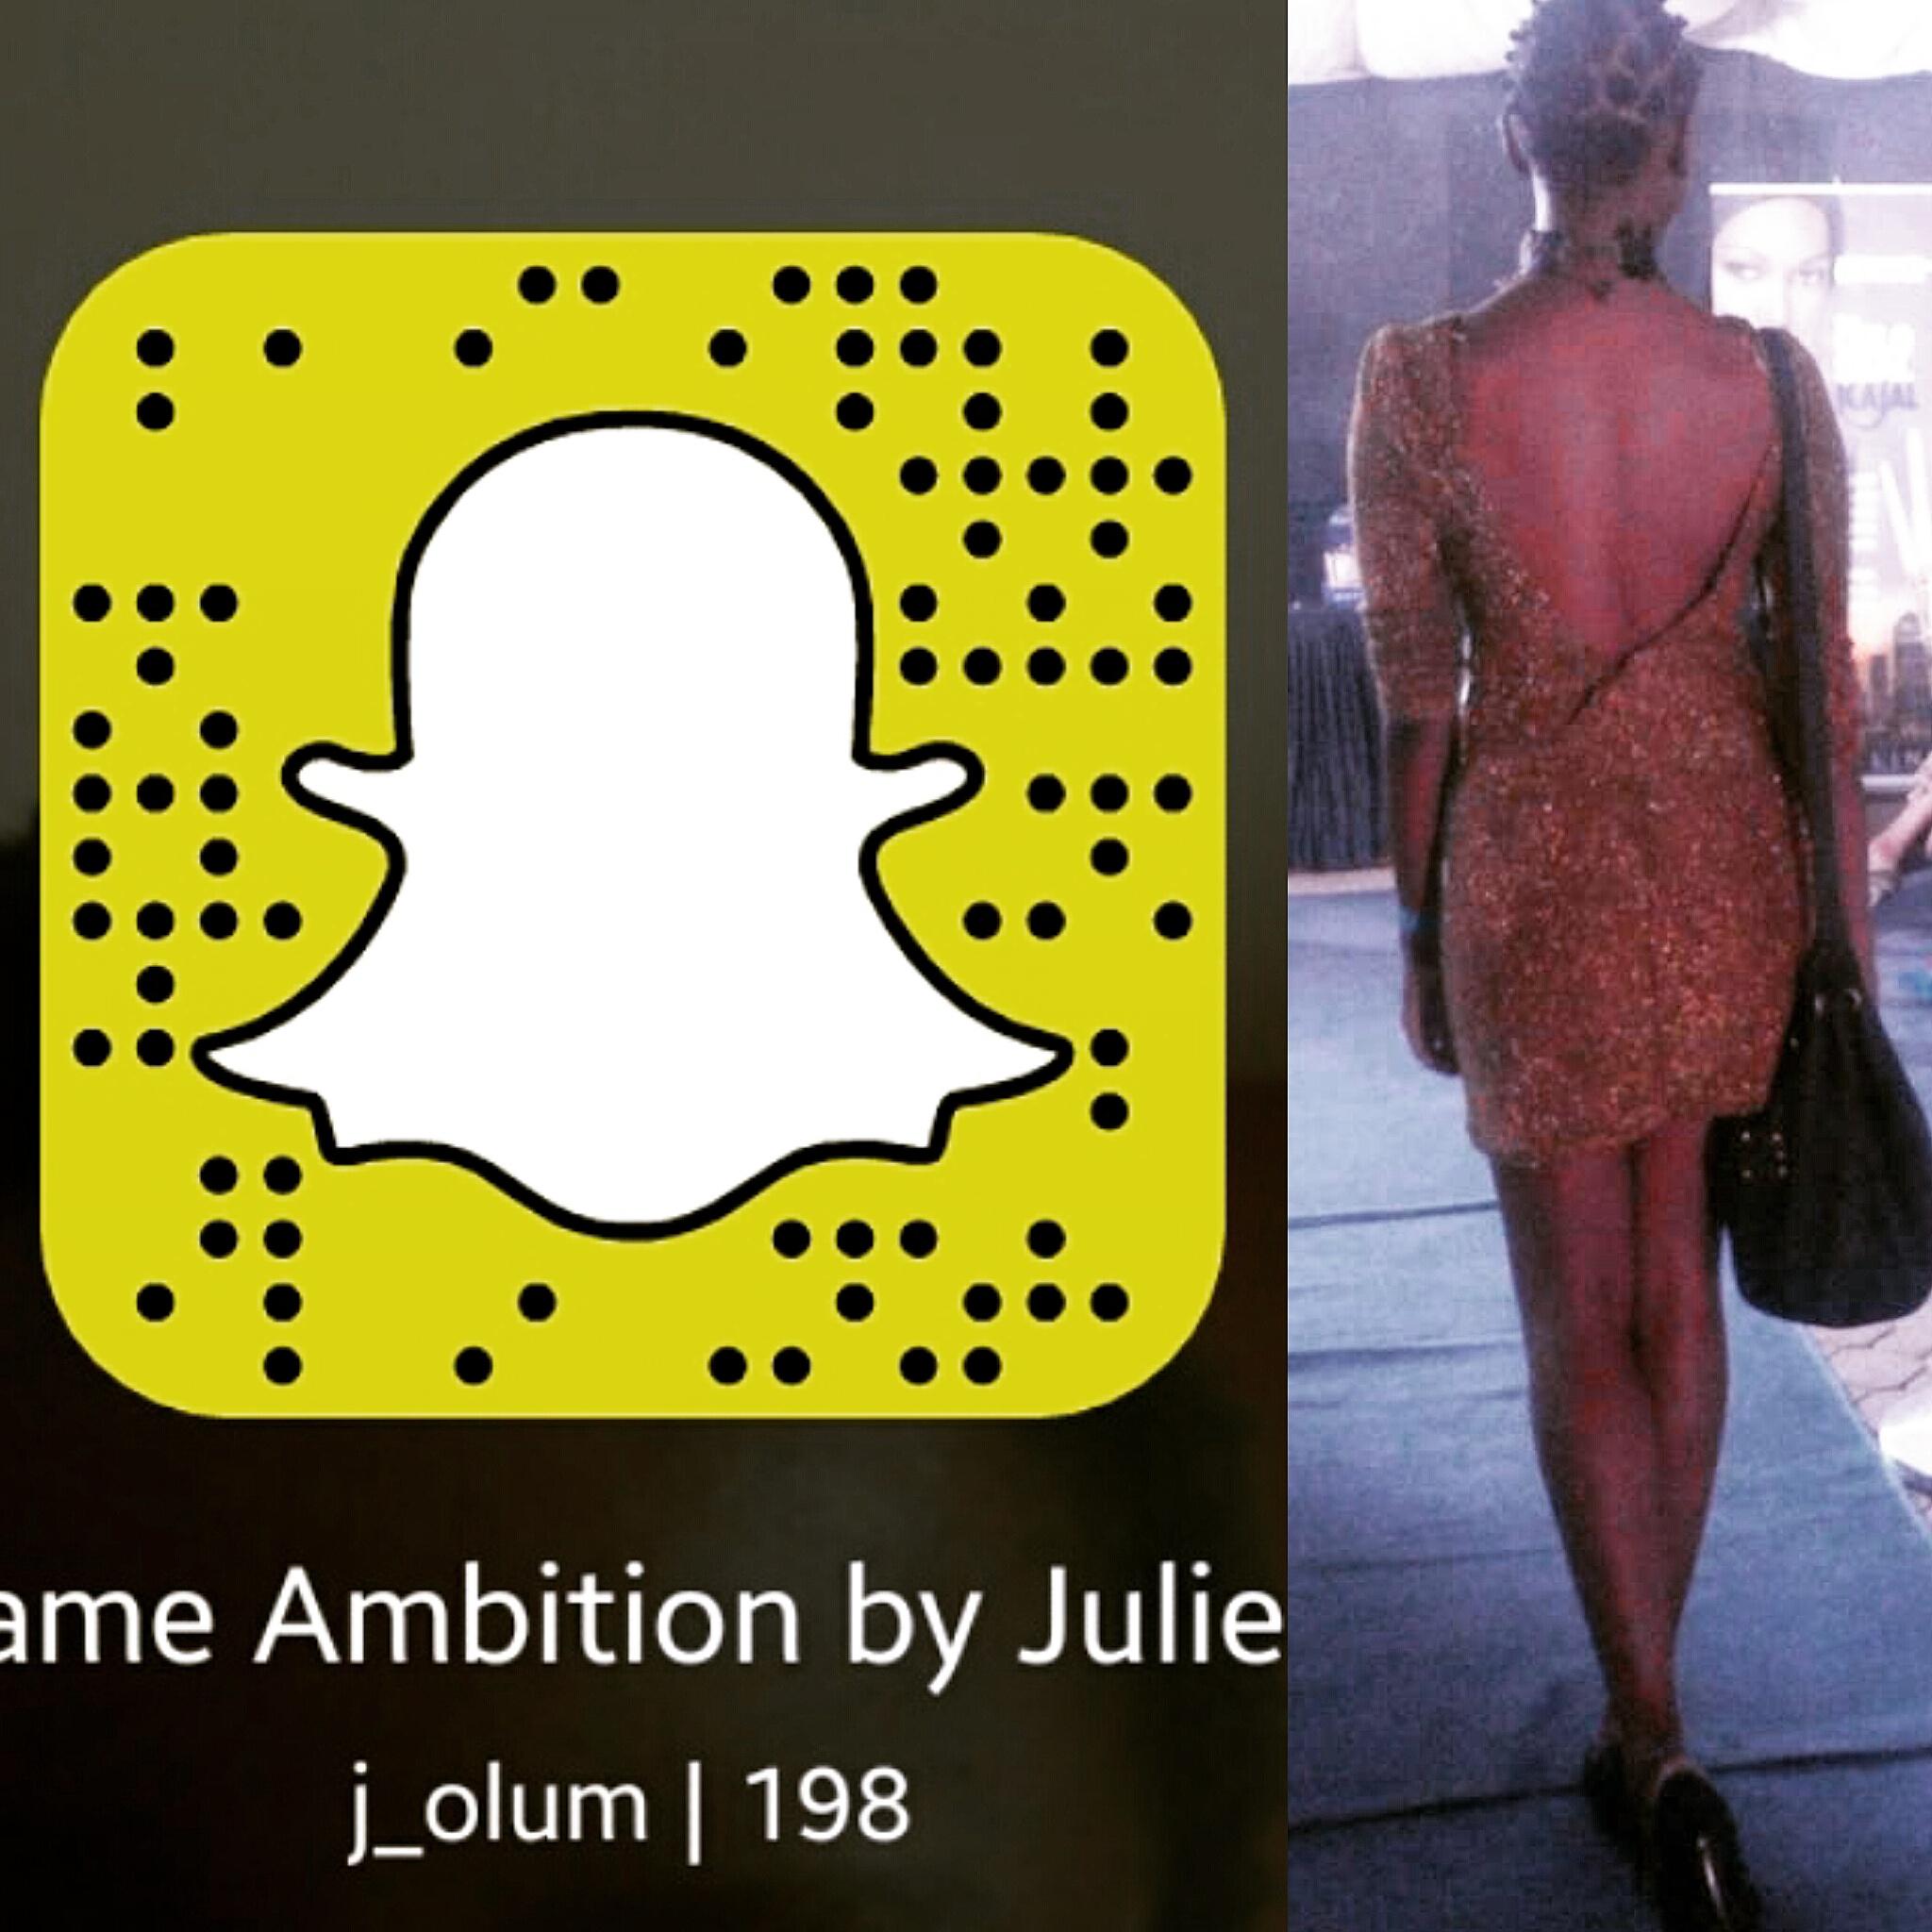 Add me on Snapchat: j_olum